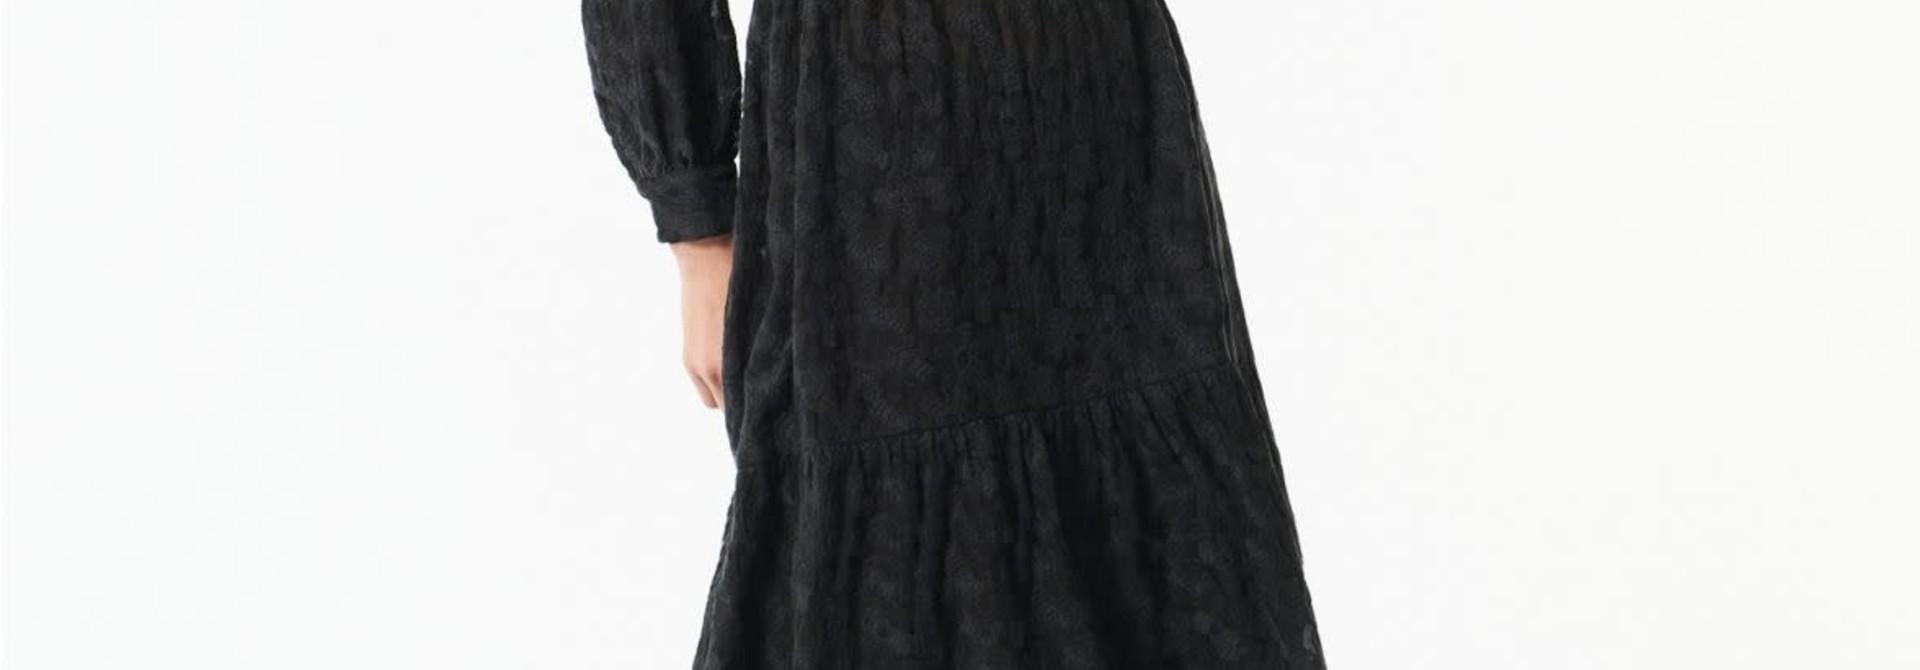 till black dress flower